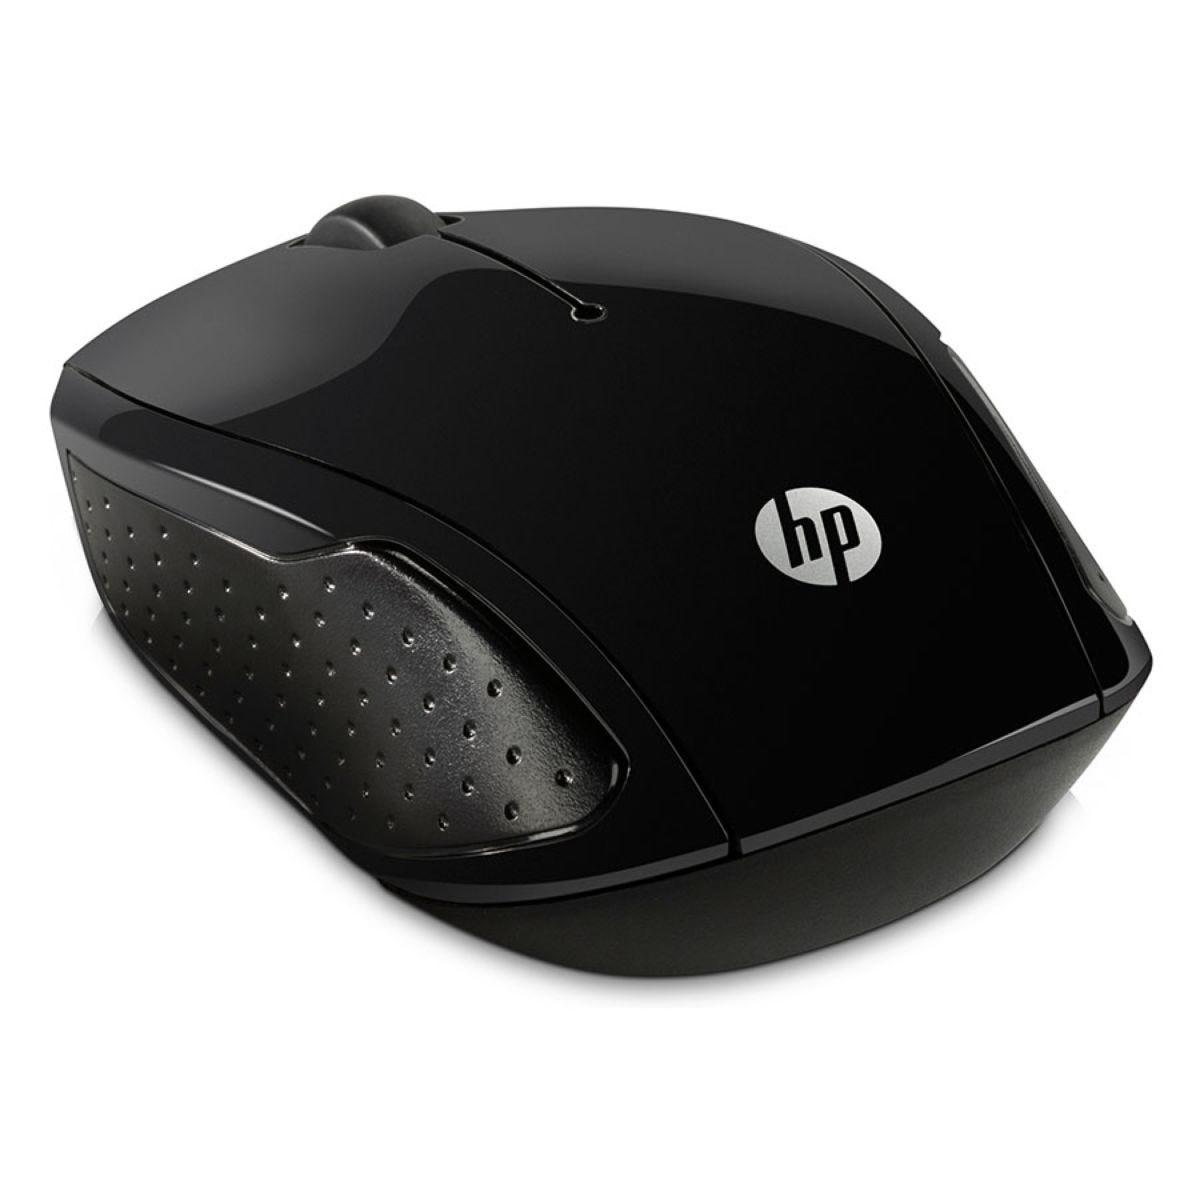 HP 200RF Wireless Optical Ambidextrous Mouse